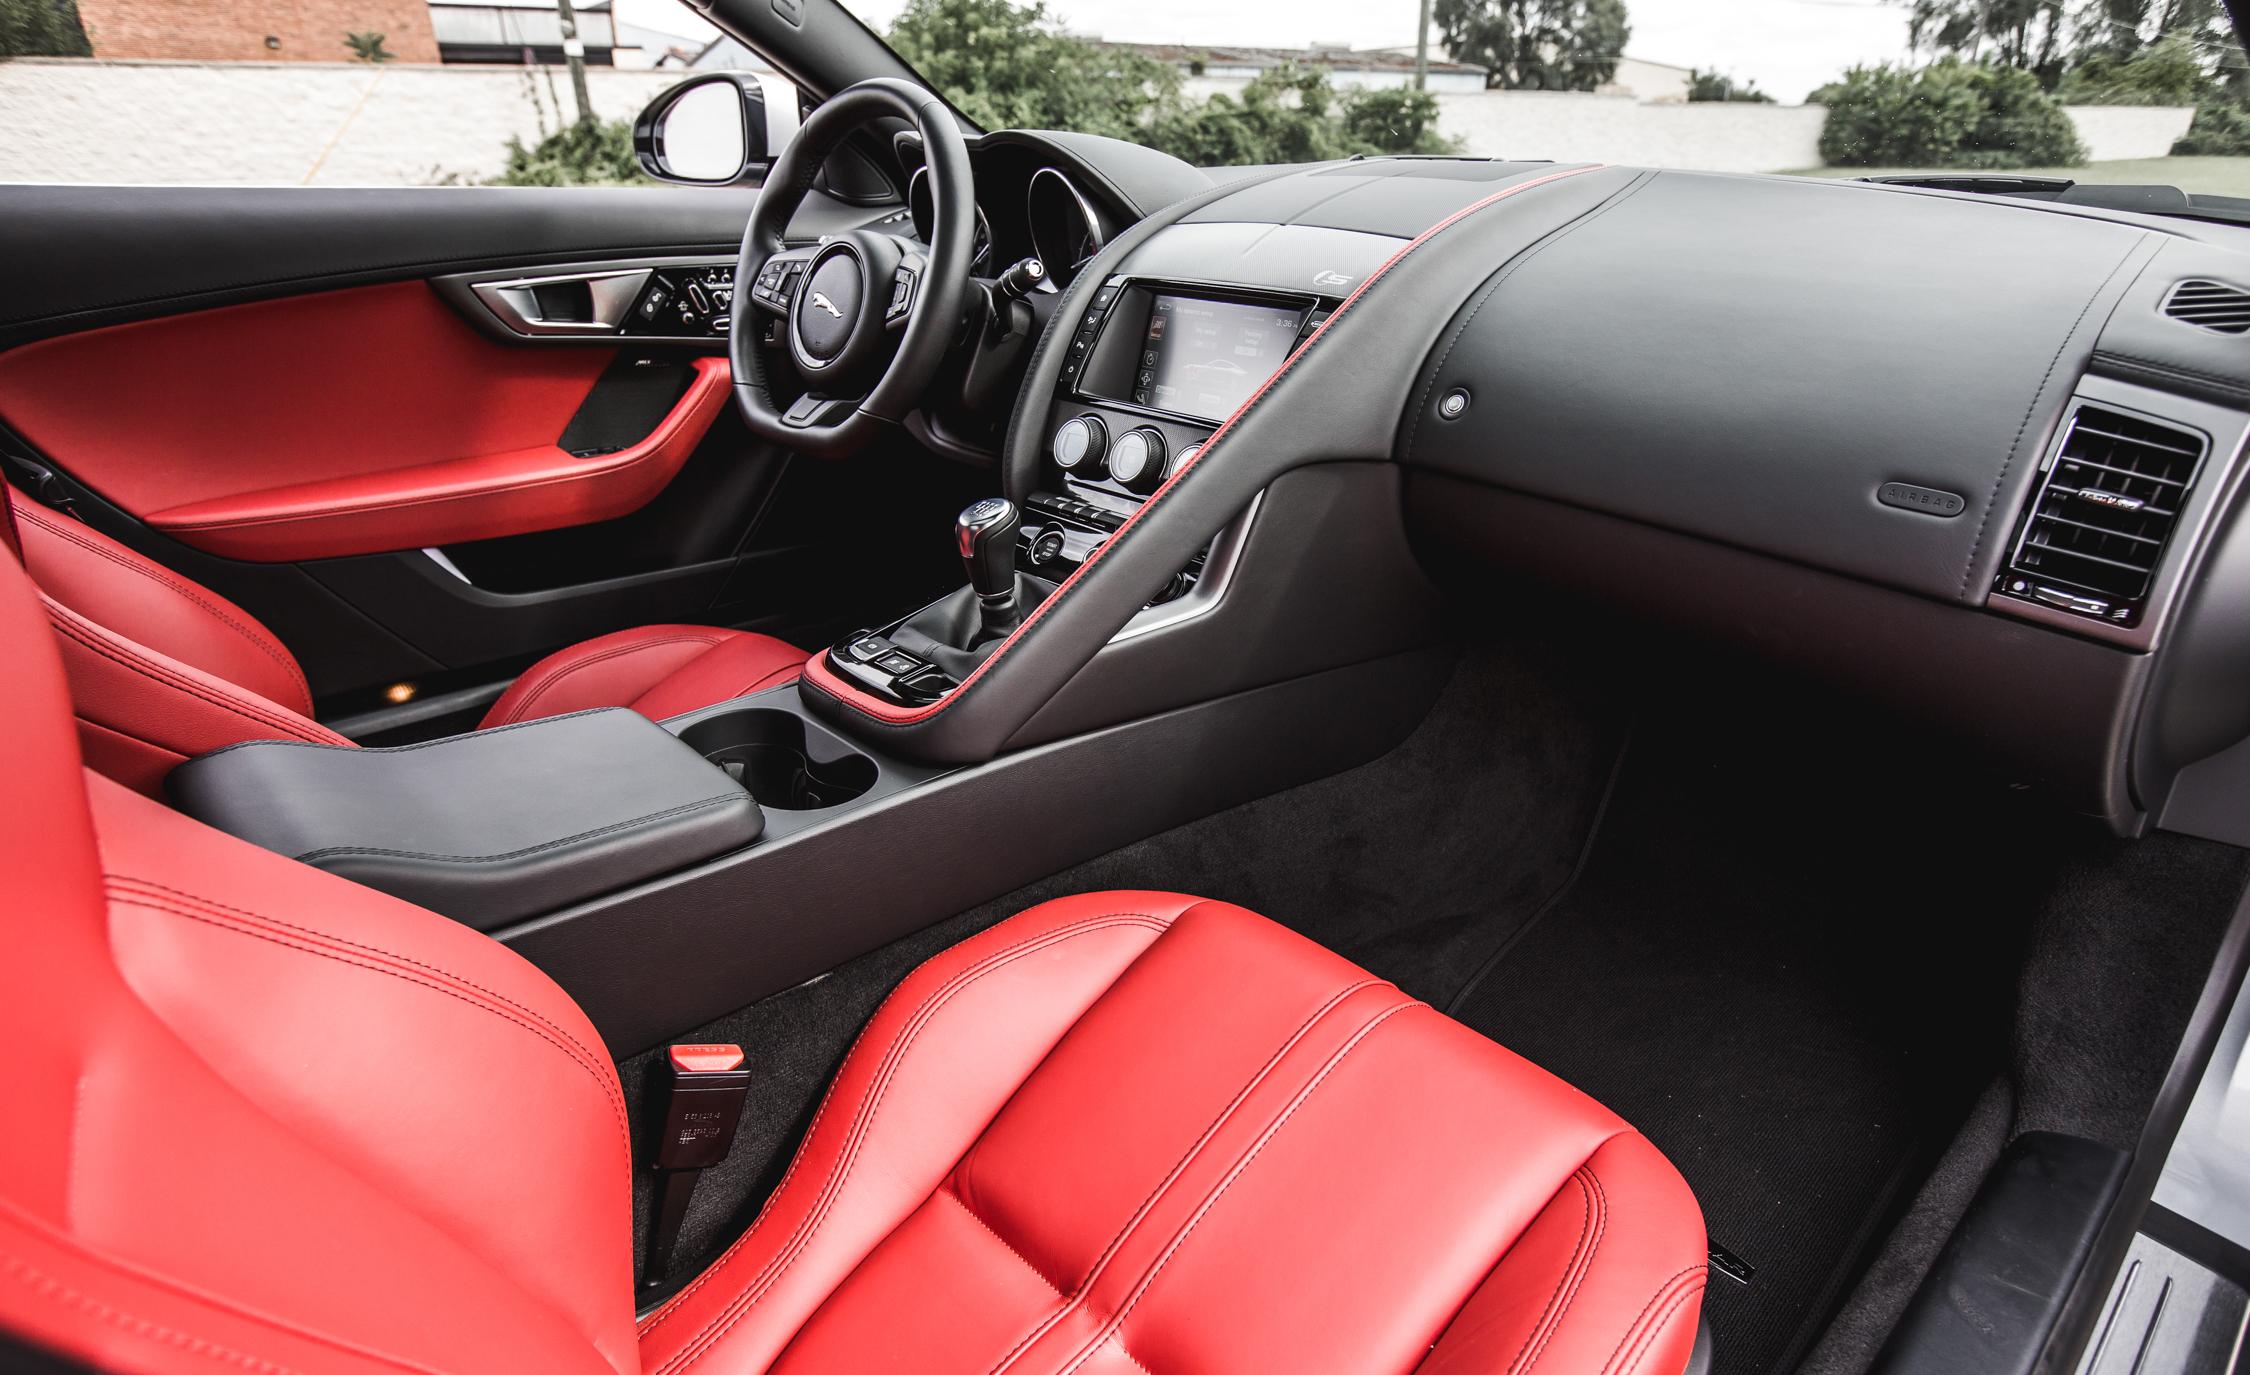 2016 Jaguar F-Type S Coupe Interior Passenger Dash